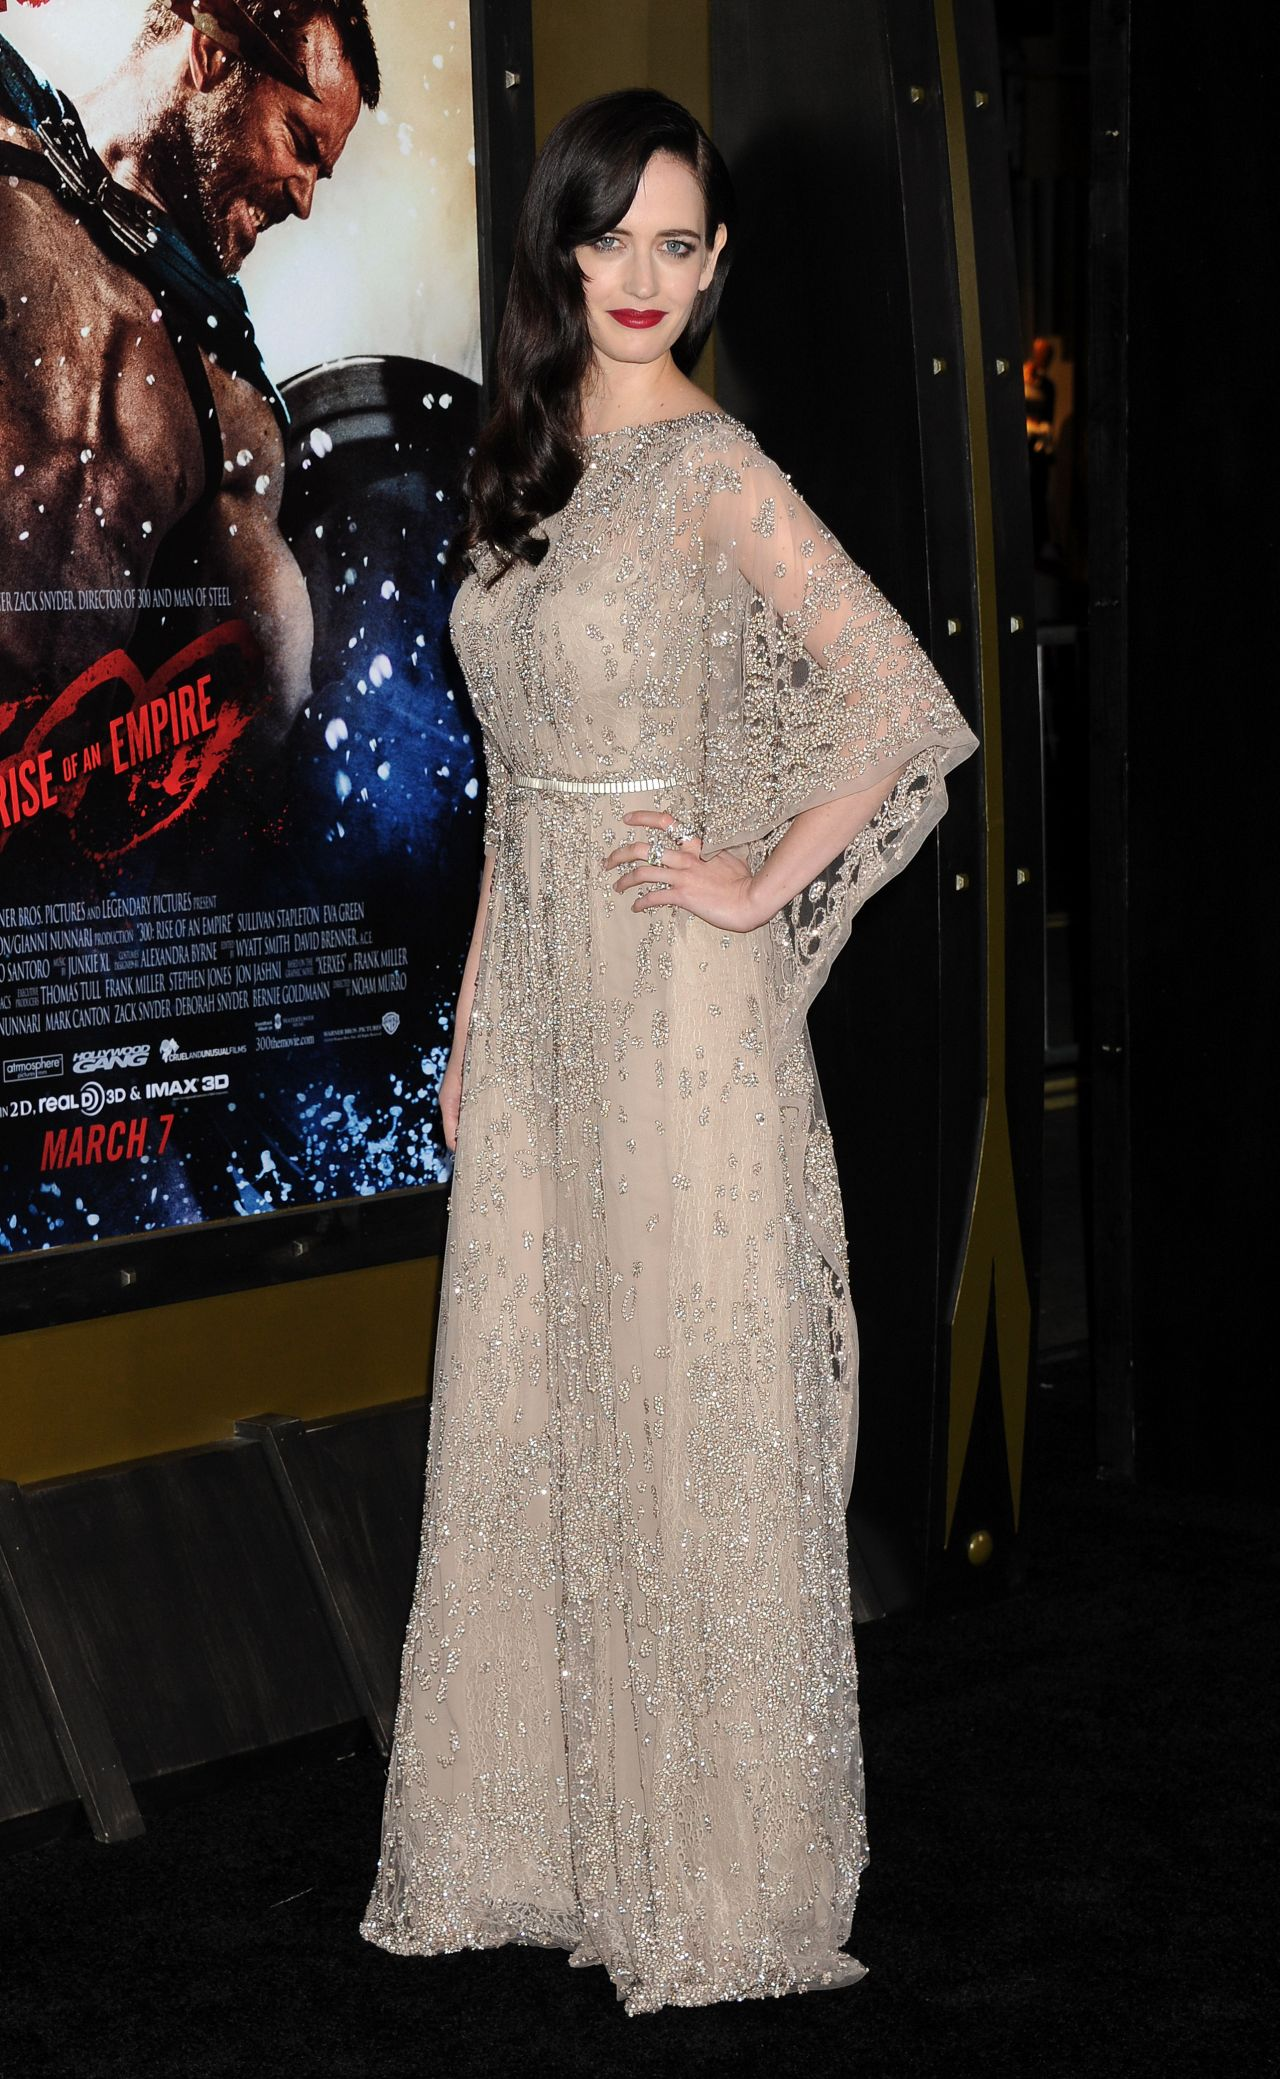 Eva Green - '300 Rise of an Empire' Premiere in Los Angeles300 Rise Of An Empire Eva Green Dress